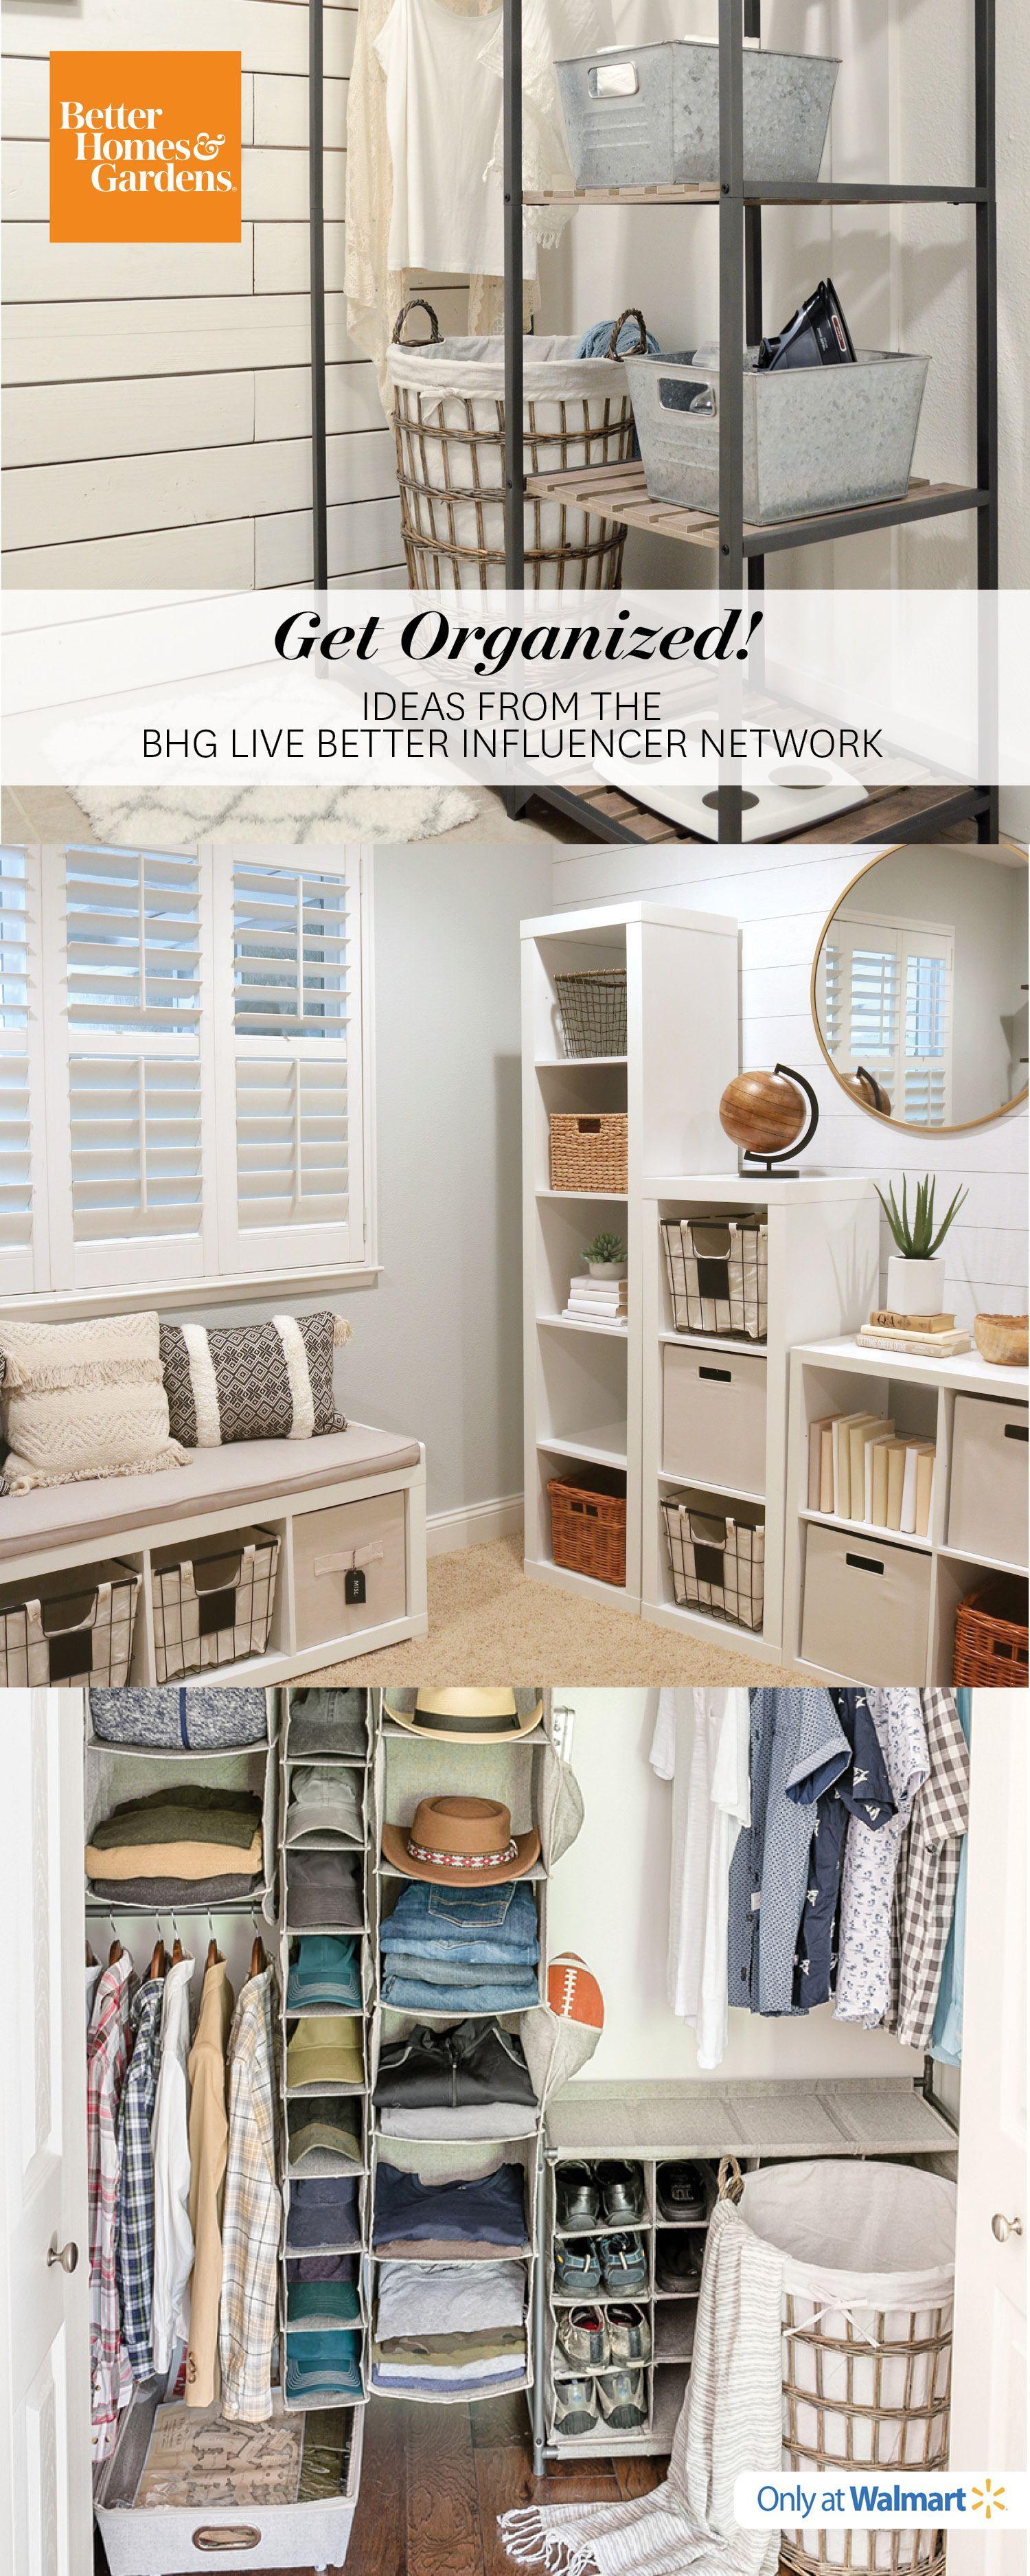 8a76123f22a2d4ec8fe5efced0d927a6 - Better Homes And Gardens Storage Ideas